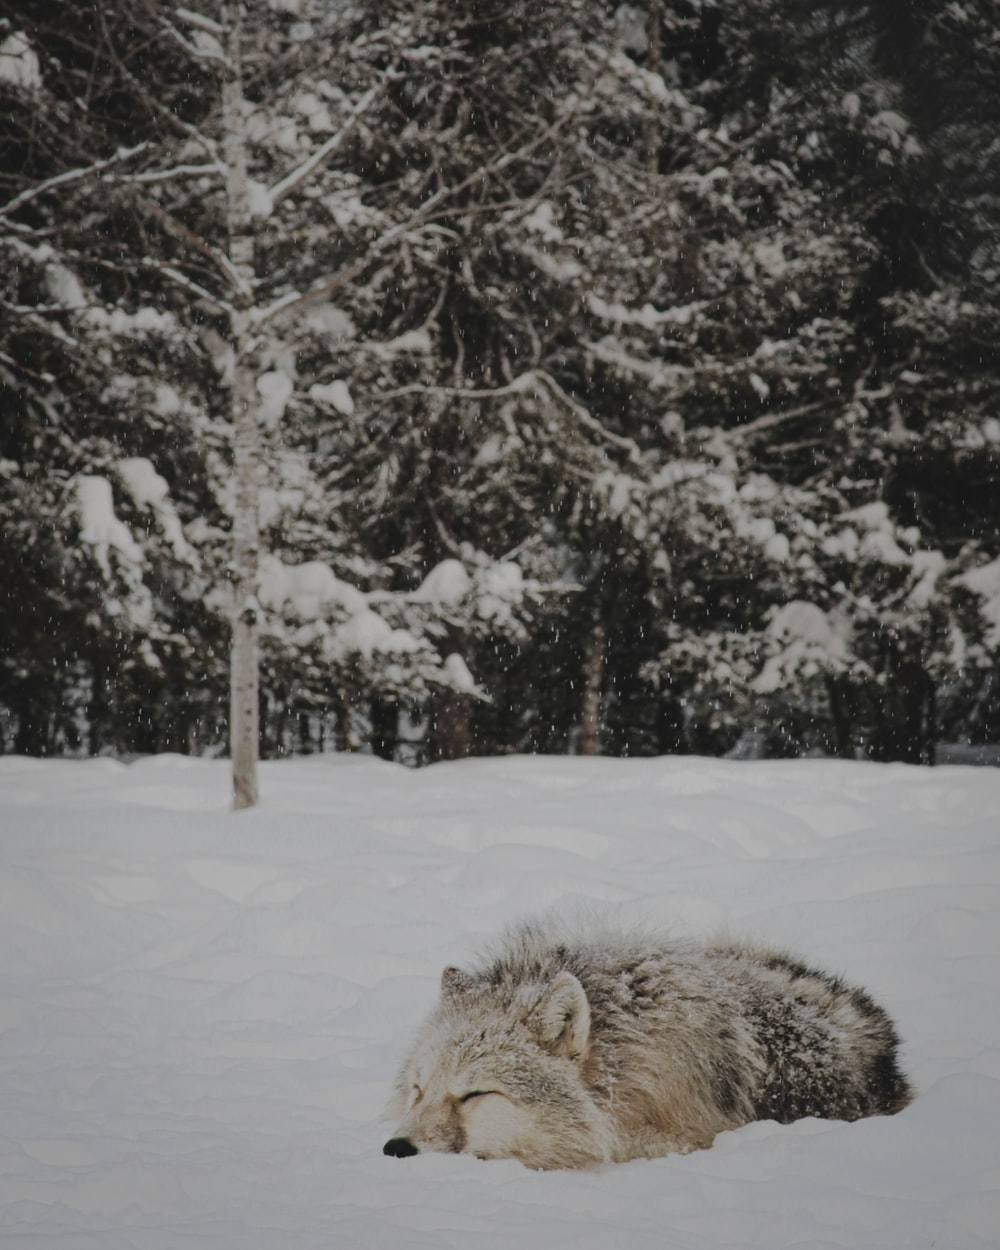 gray wolf lying on snow